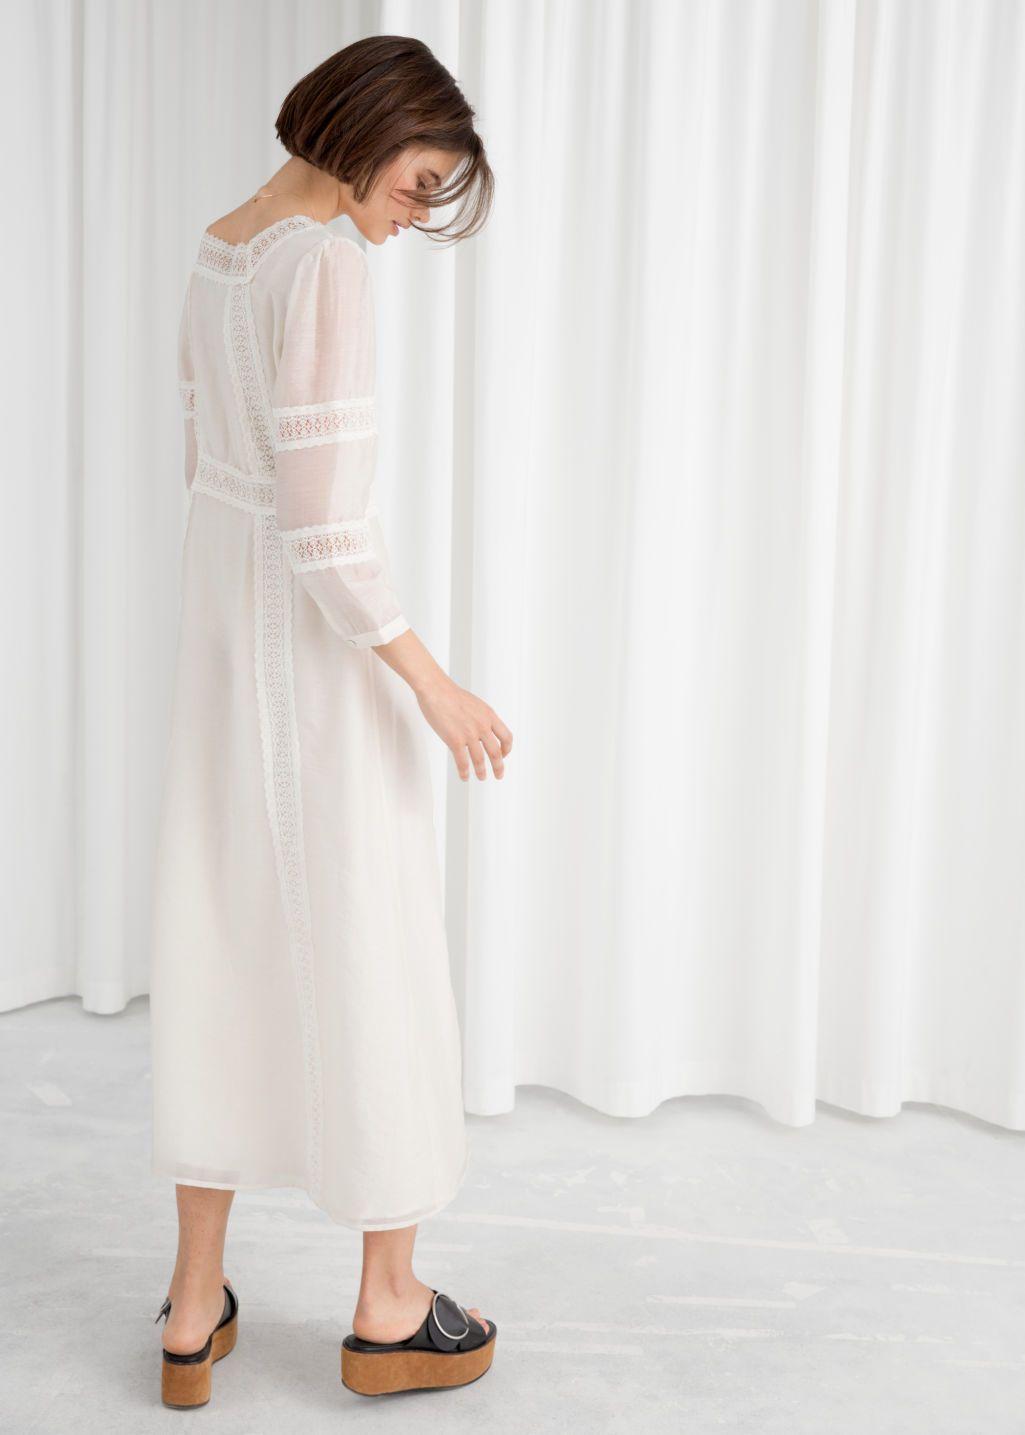 Pdp Midi Dress Dresses Lace Midi Dress [ 1435 x 1025 Pixel ]